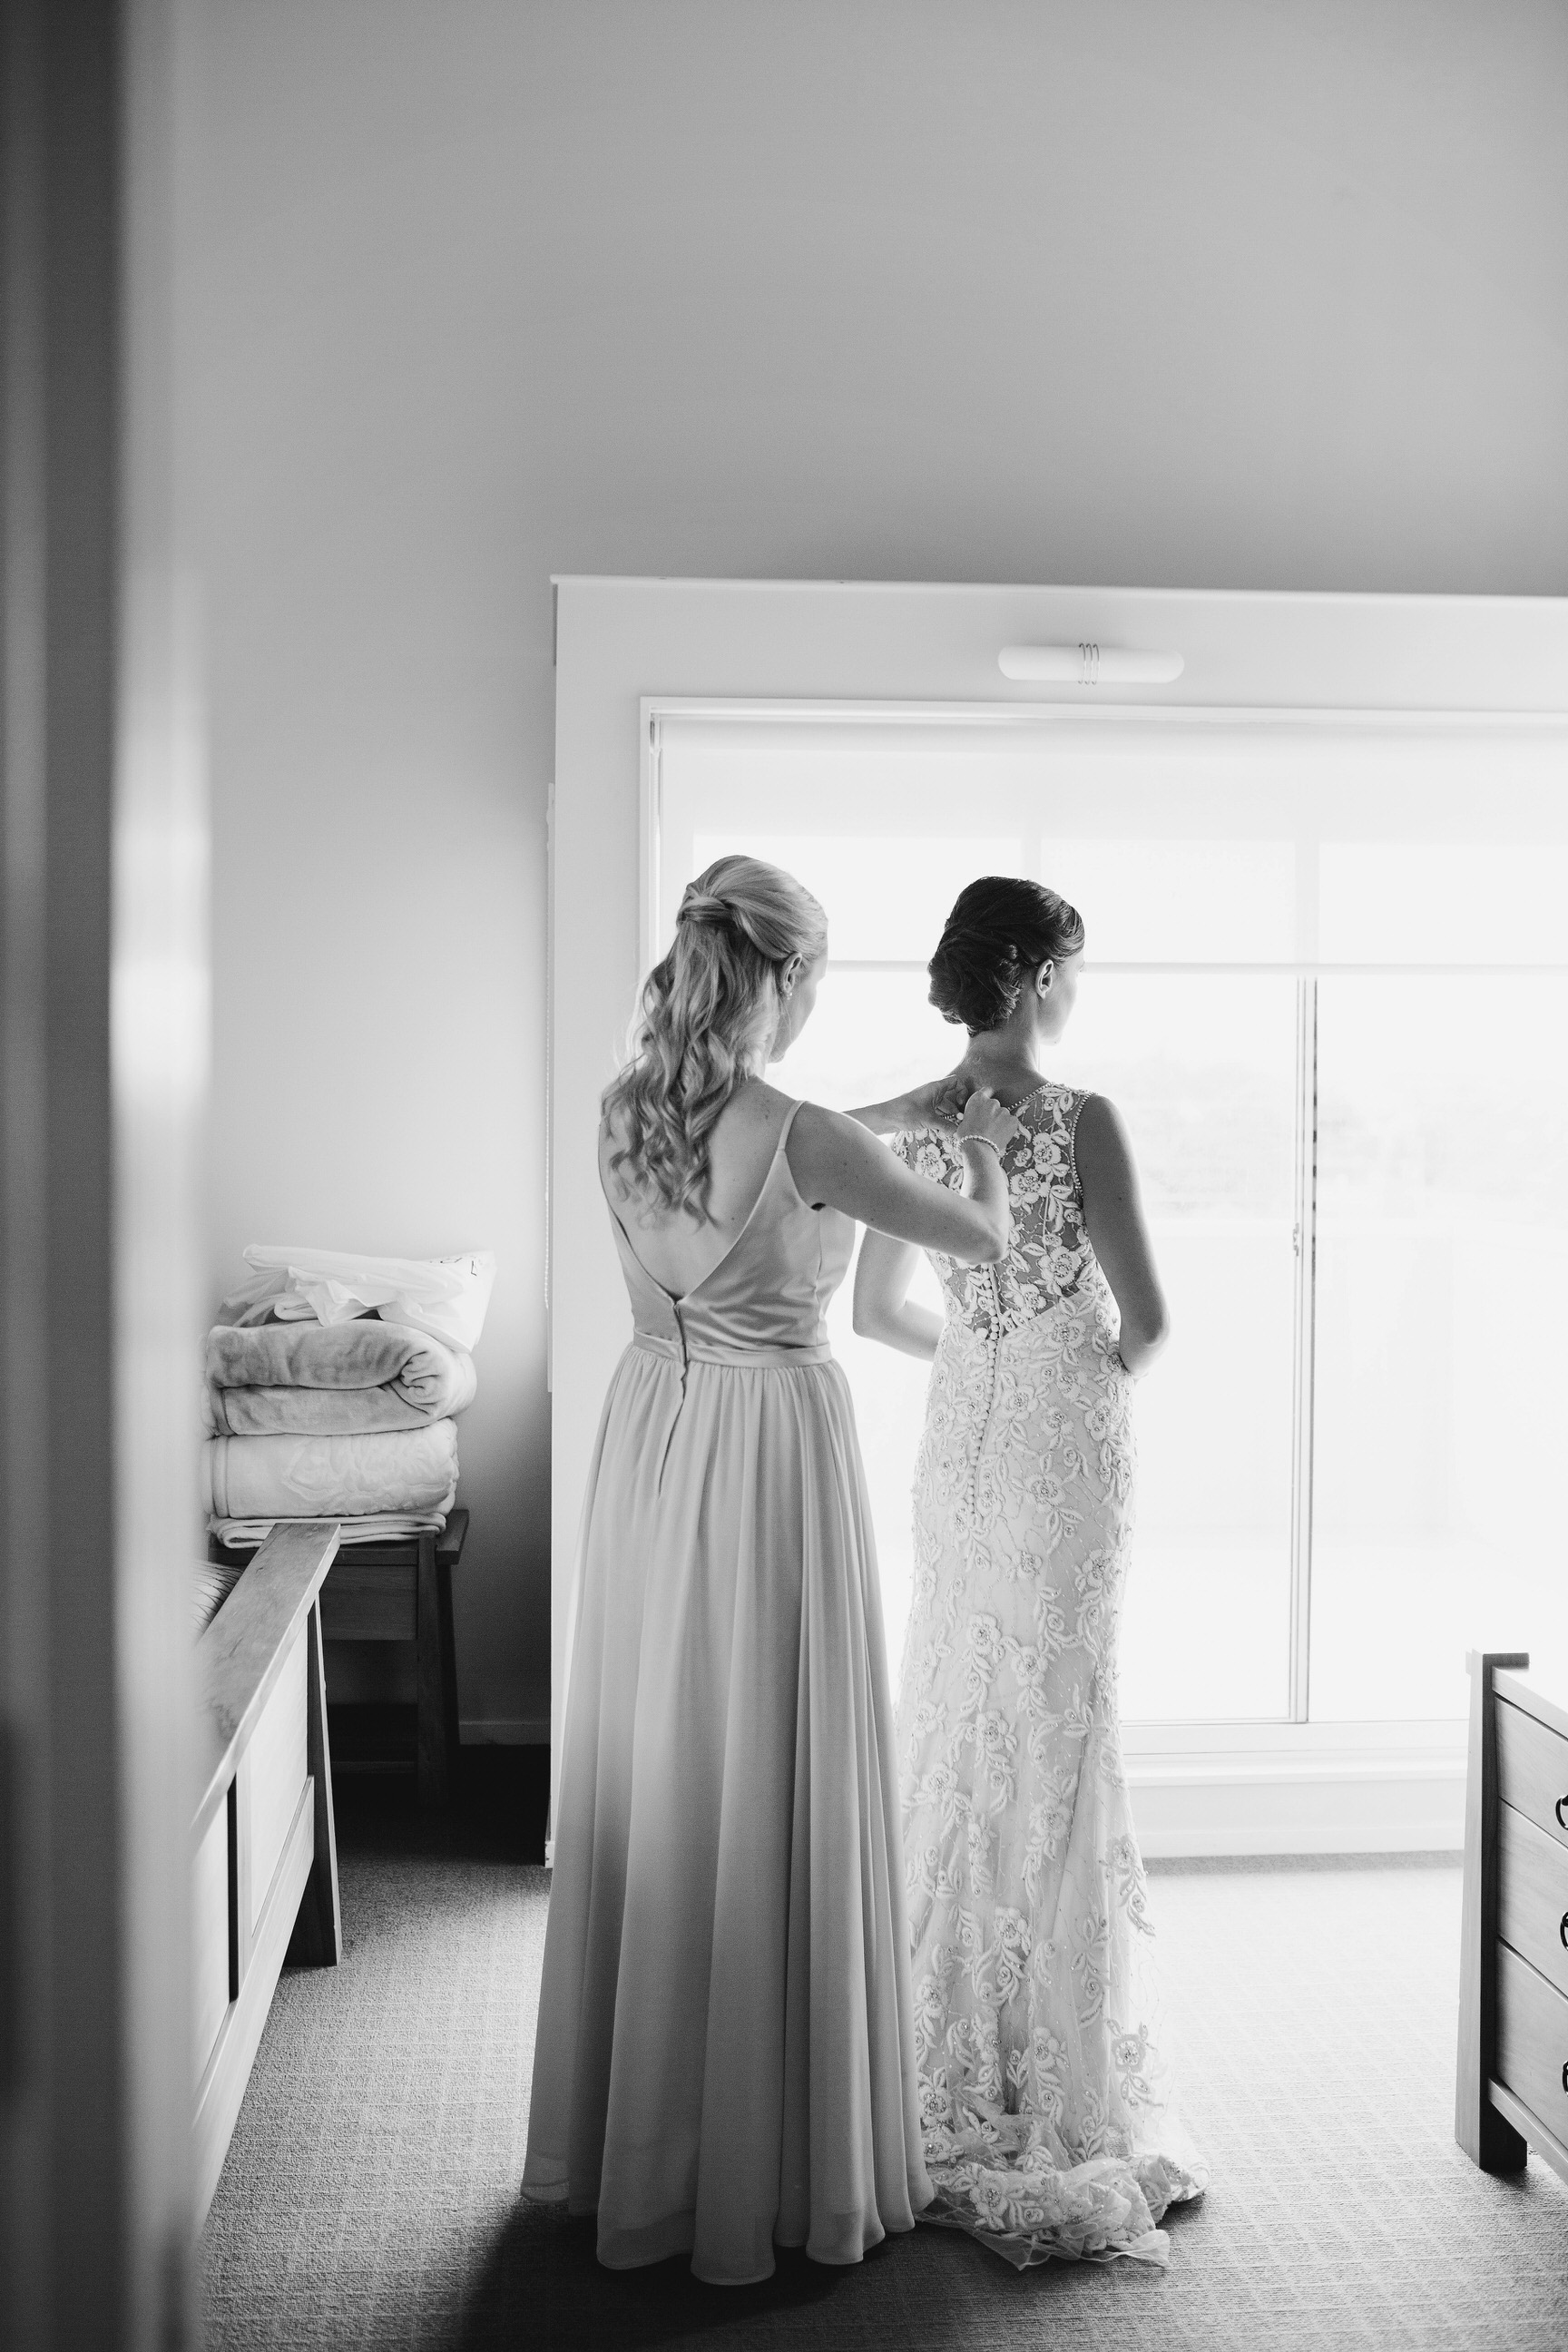 Martinborough-Poppies-Wedding-Caine-Eloise-Toni-Larsen-0026.jpg